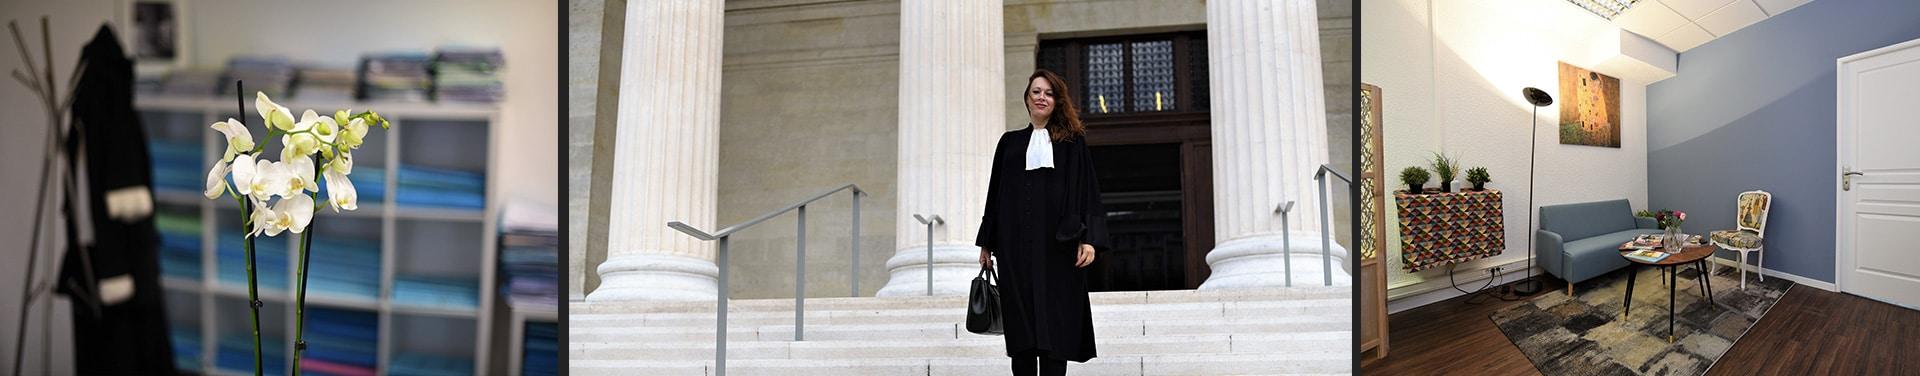 avocat marseille 13001